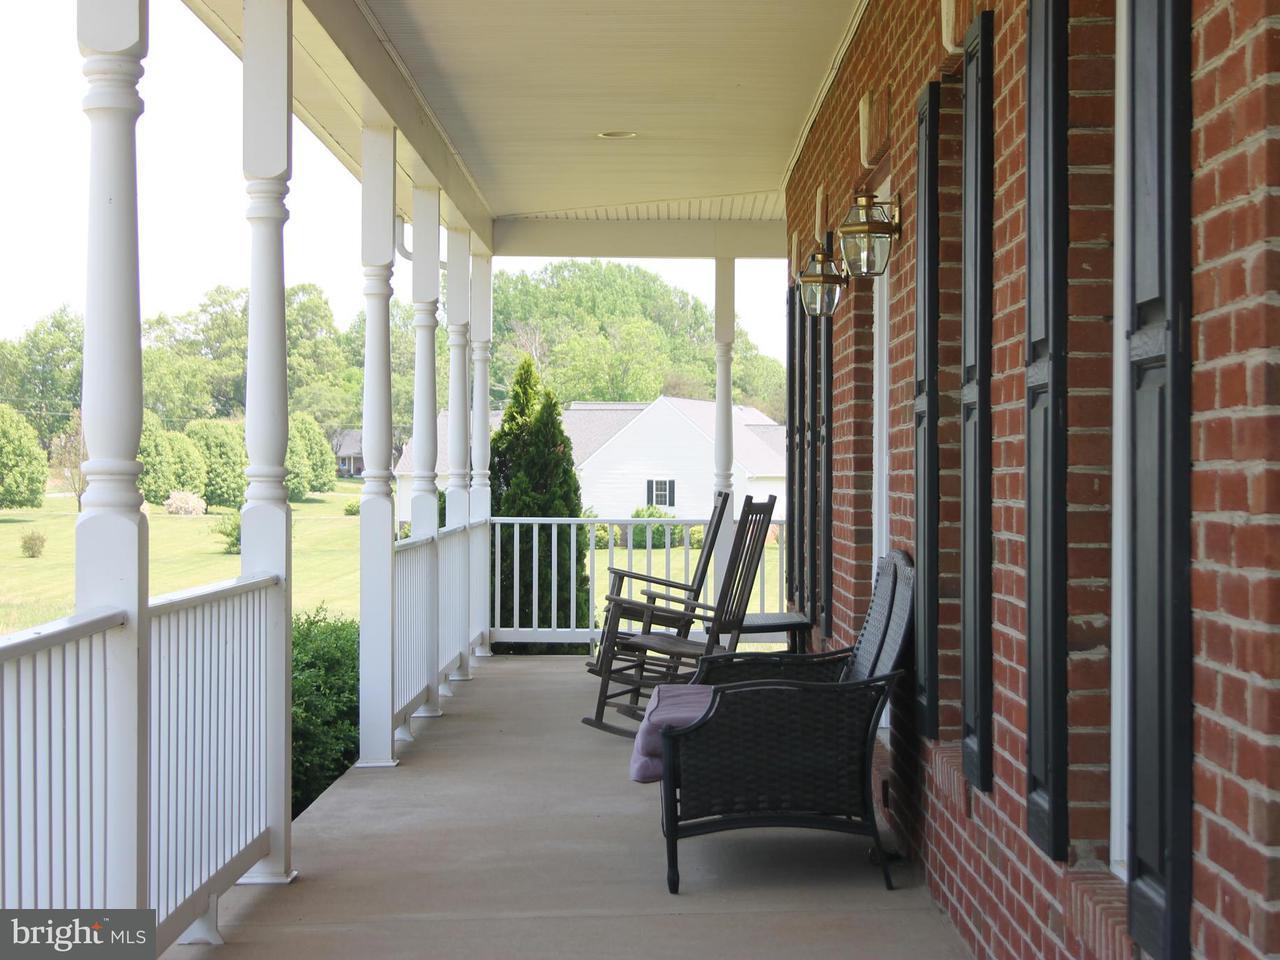 Single Family Home for Sale at 16548 Bradford Road 16548 Bradford Road Culpeper, Virginia 22701 United States